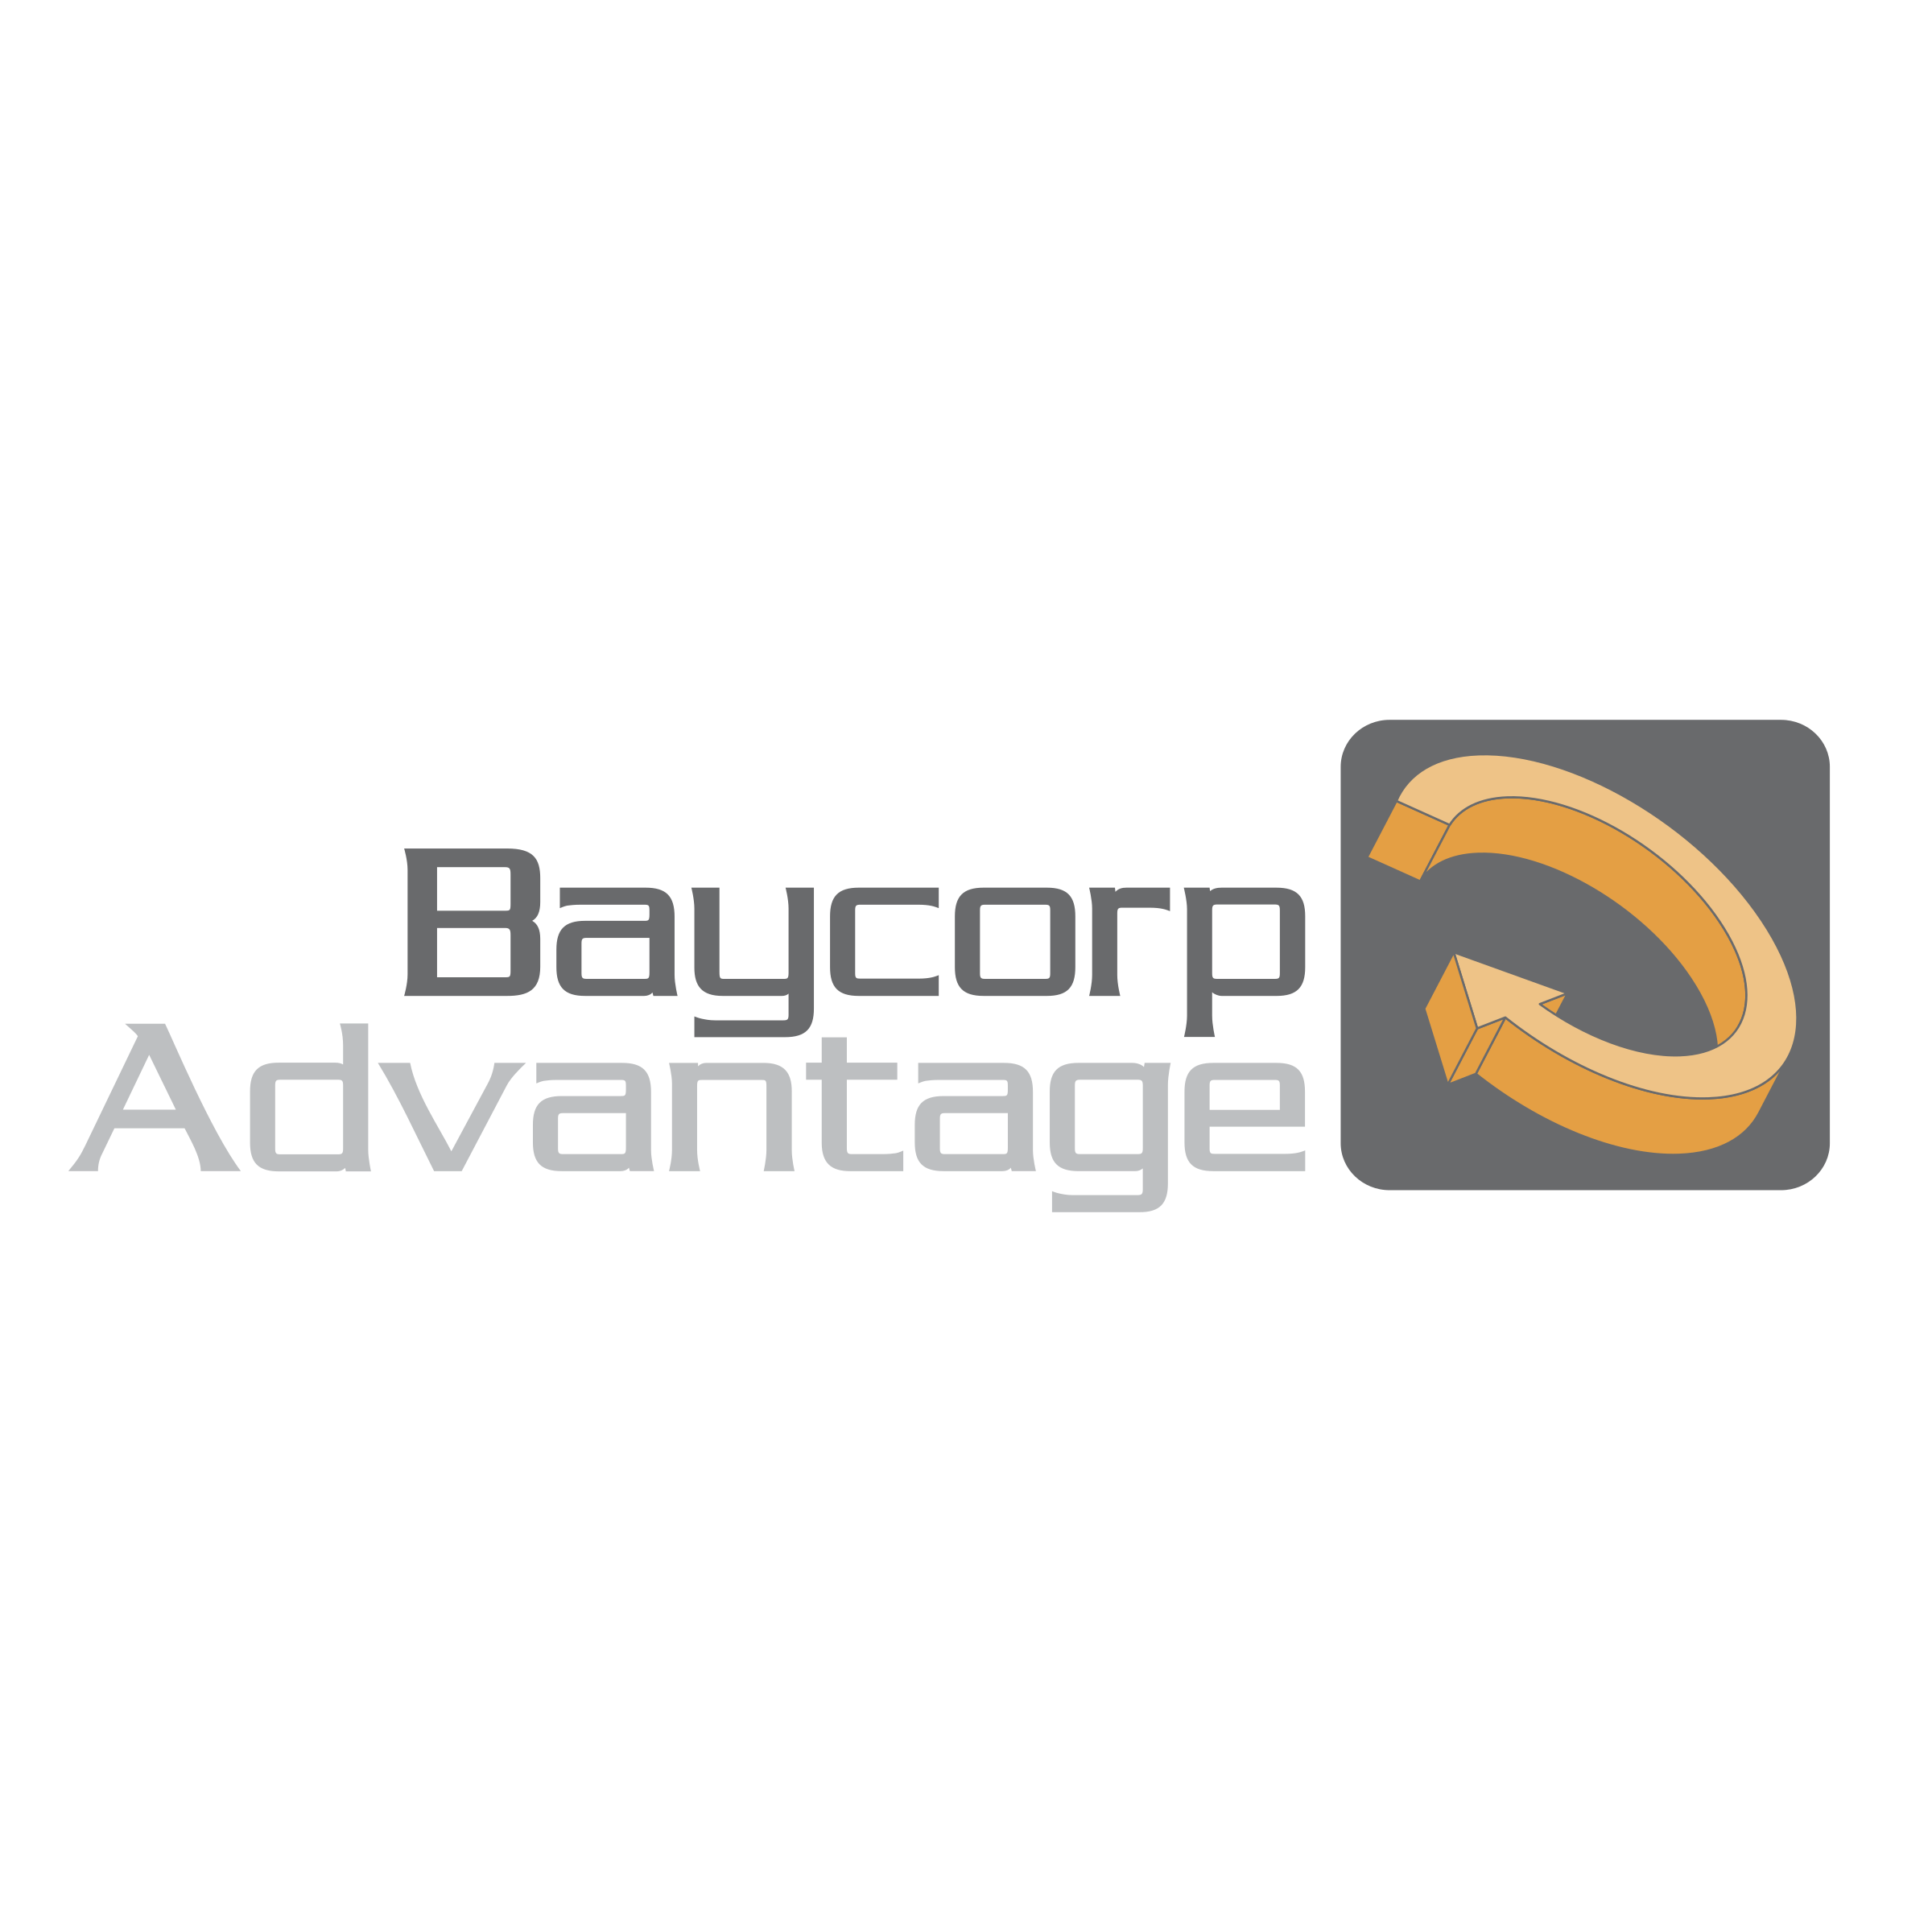 Baycorp Advantage Logo PNG Transparent & SVG Vector.